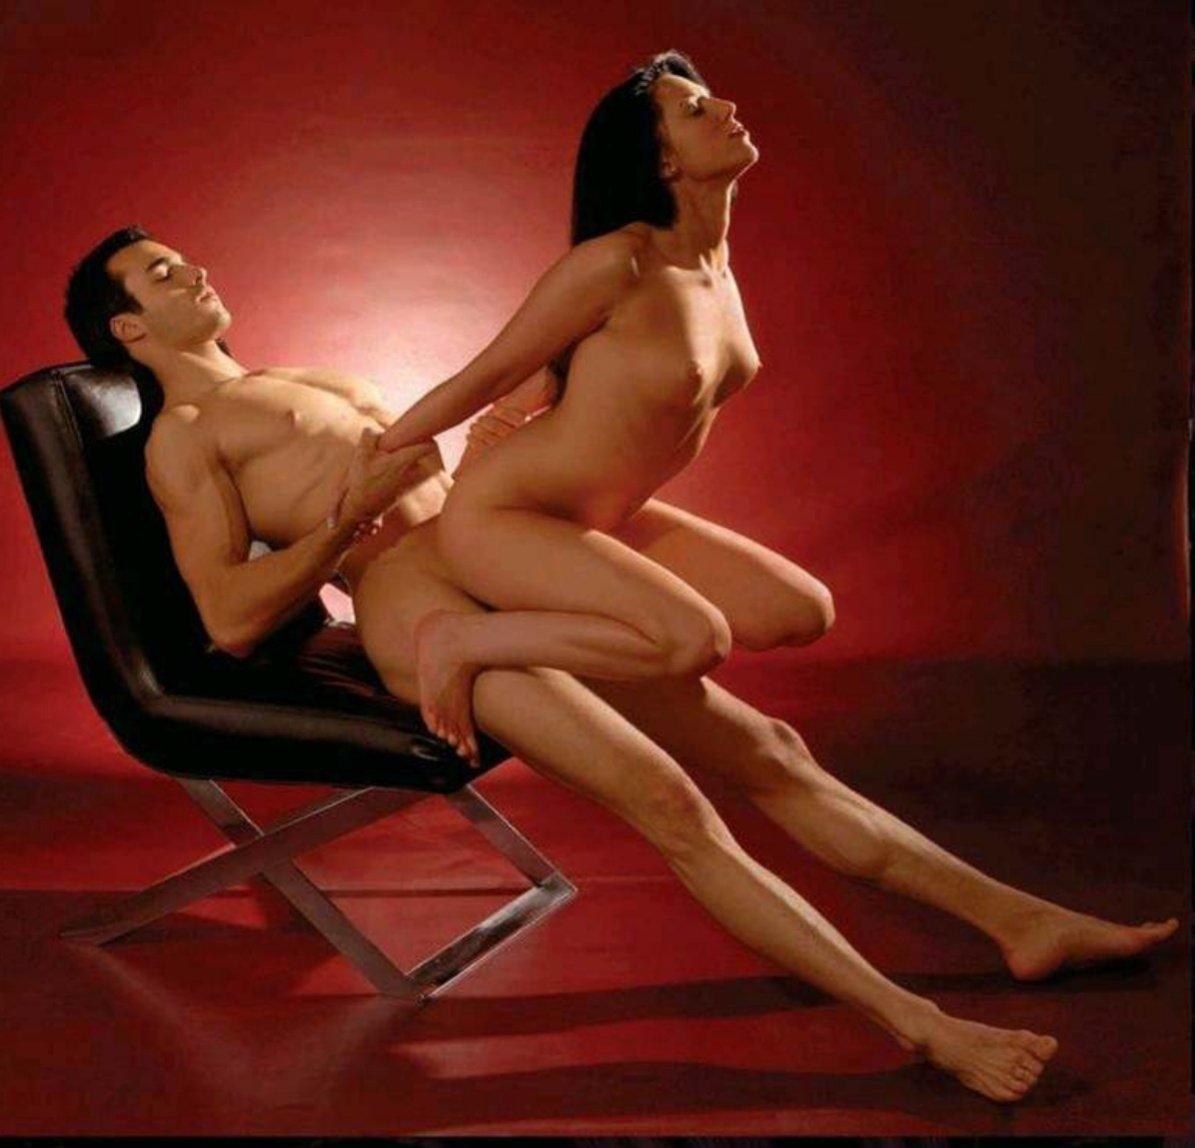 Nude photos of the kamasutra